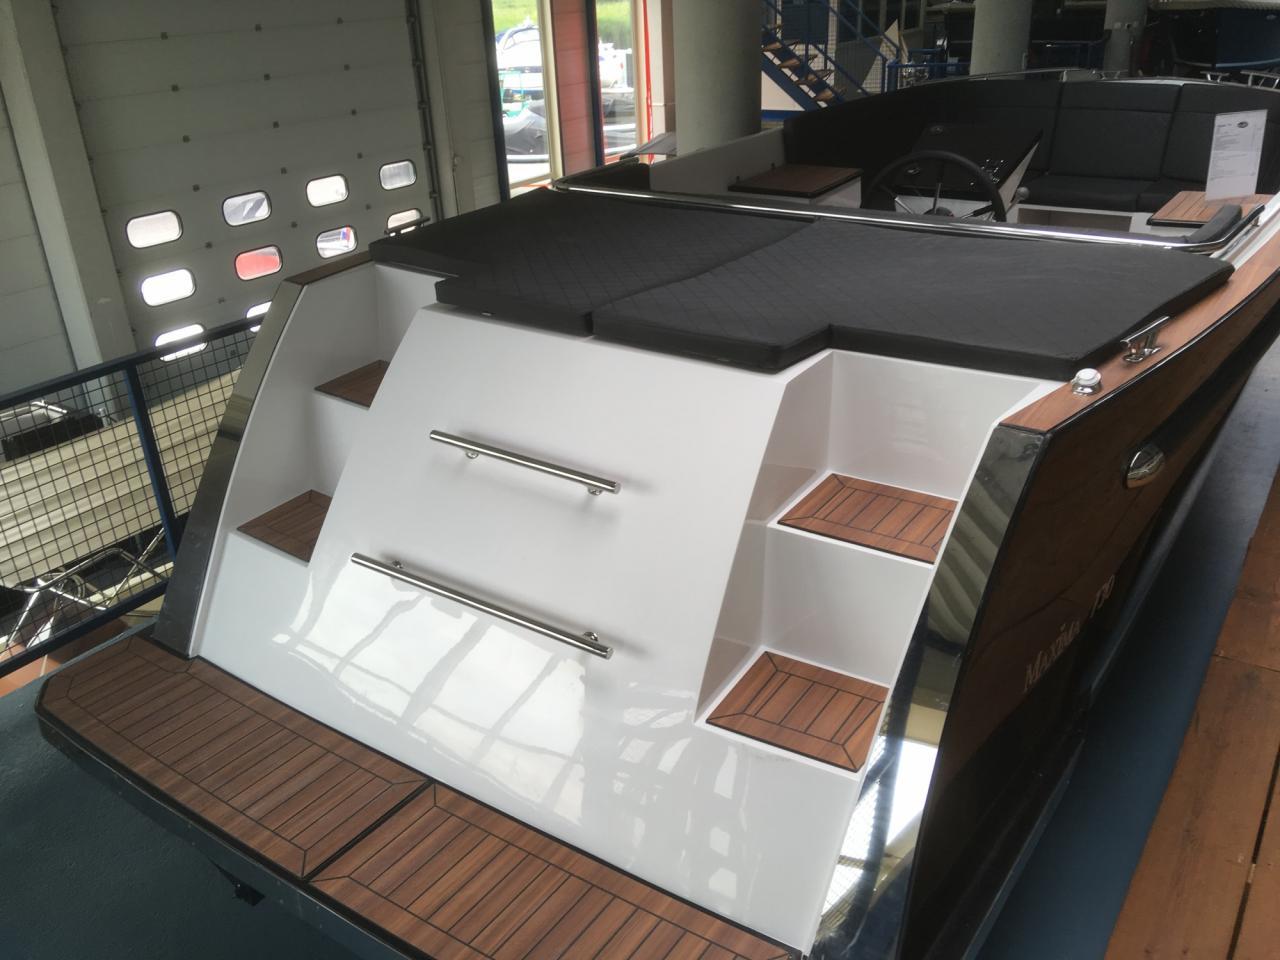 Maxima 730 tendersloep met Honda 135 pk motor DIRECT LEVERBAAR! 3